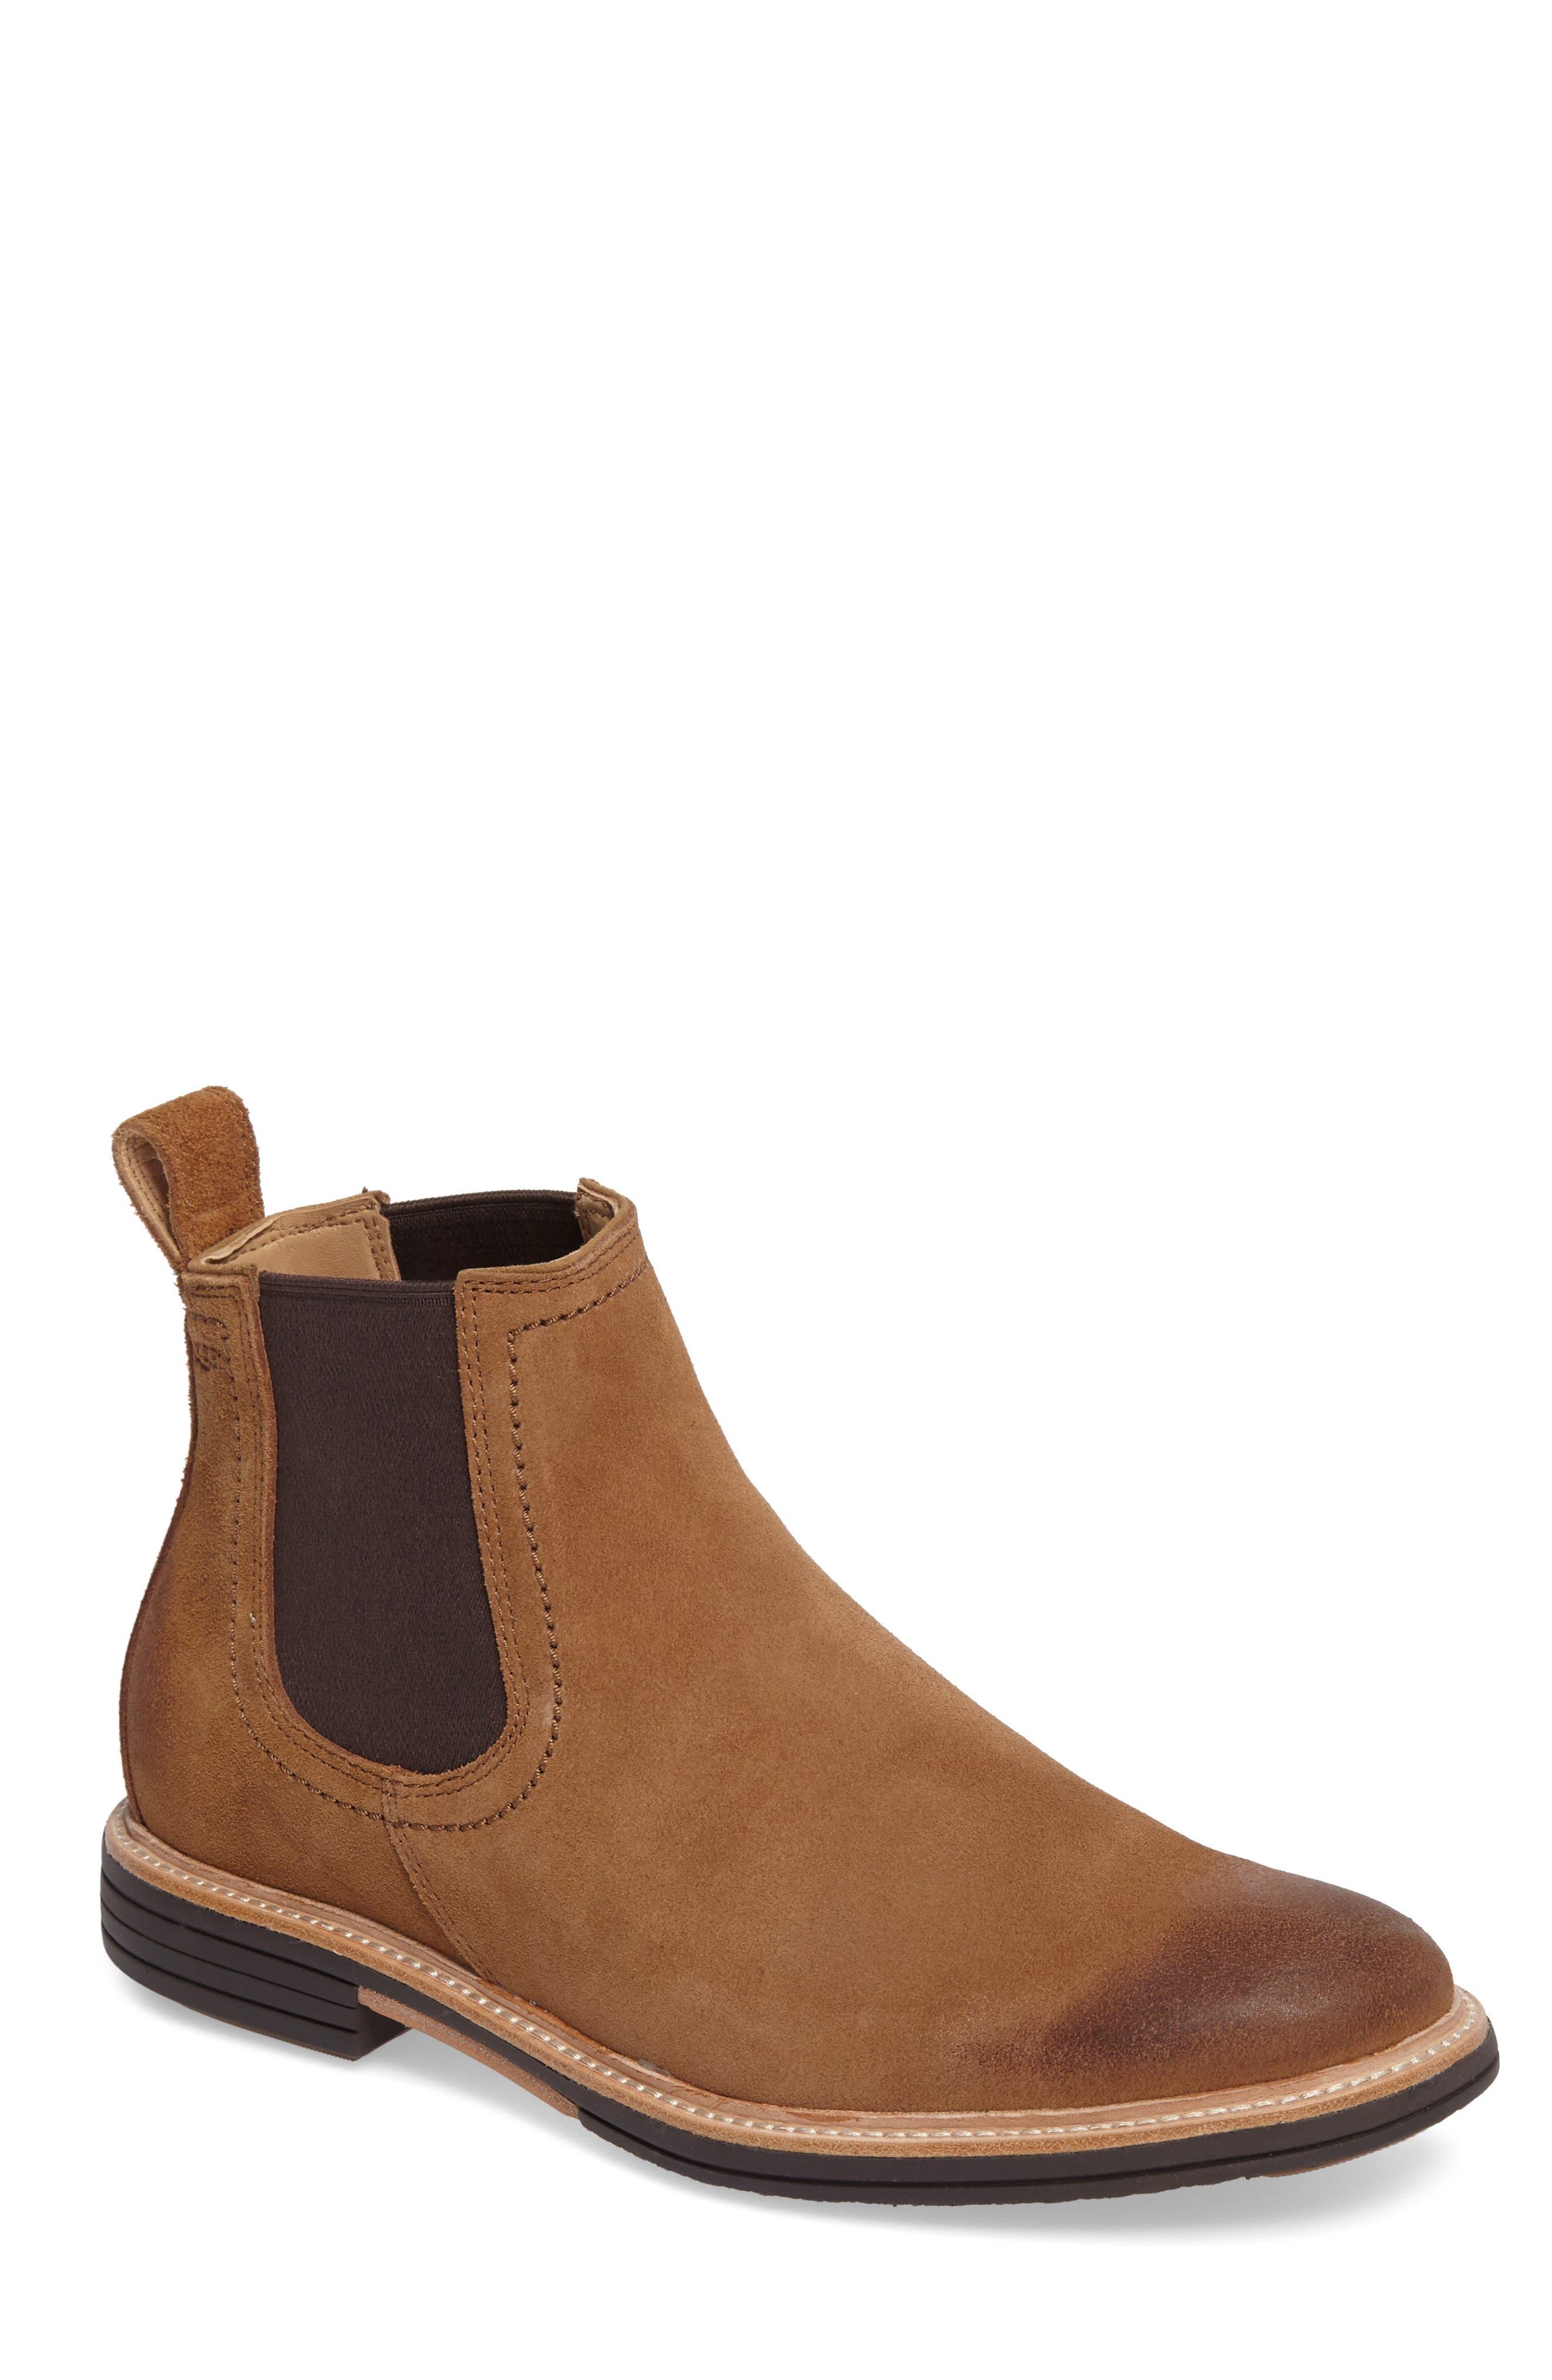 Baldvin Chelsea Boot,                         Main,                         color, Chestnut